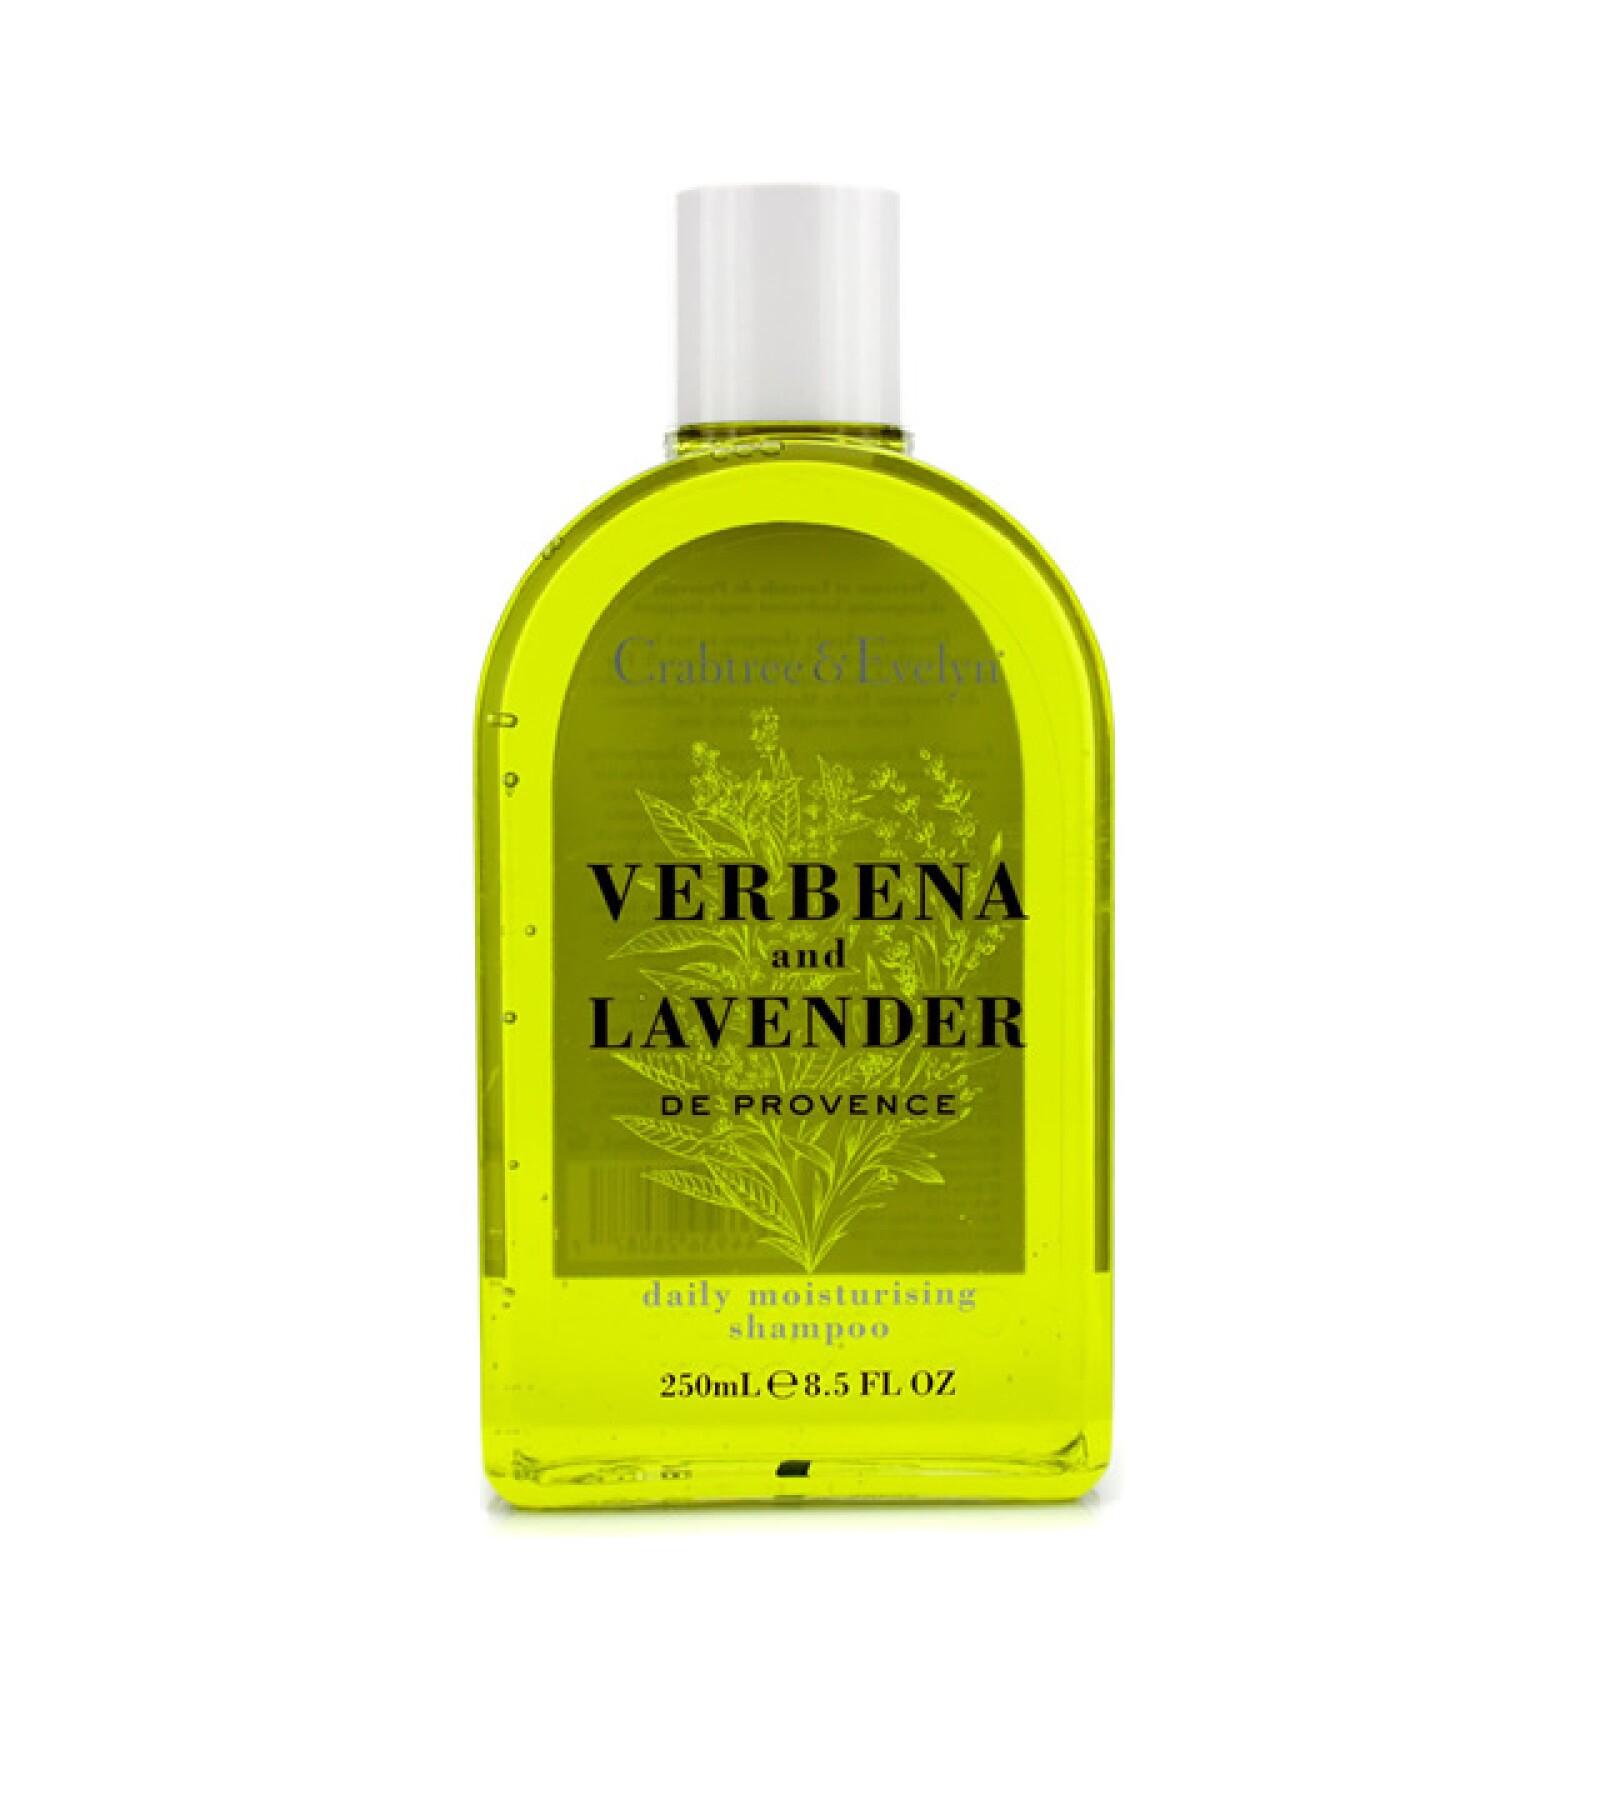 Crabtree & Evelyn: Verbena and Lavender Daily Moisturising Shampoo. 295 pesos. Plaza Carso.